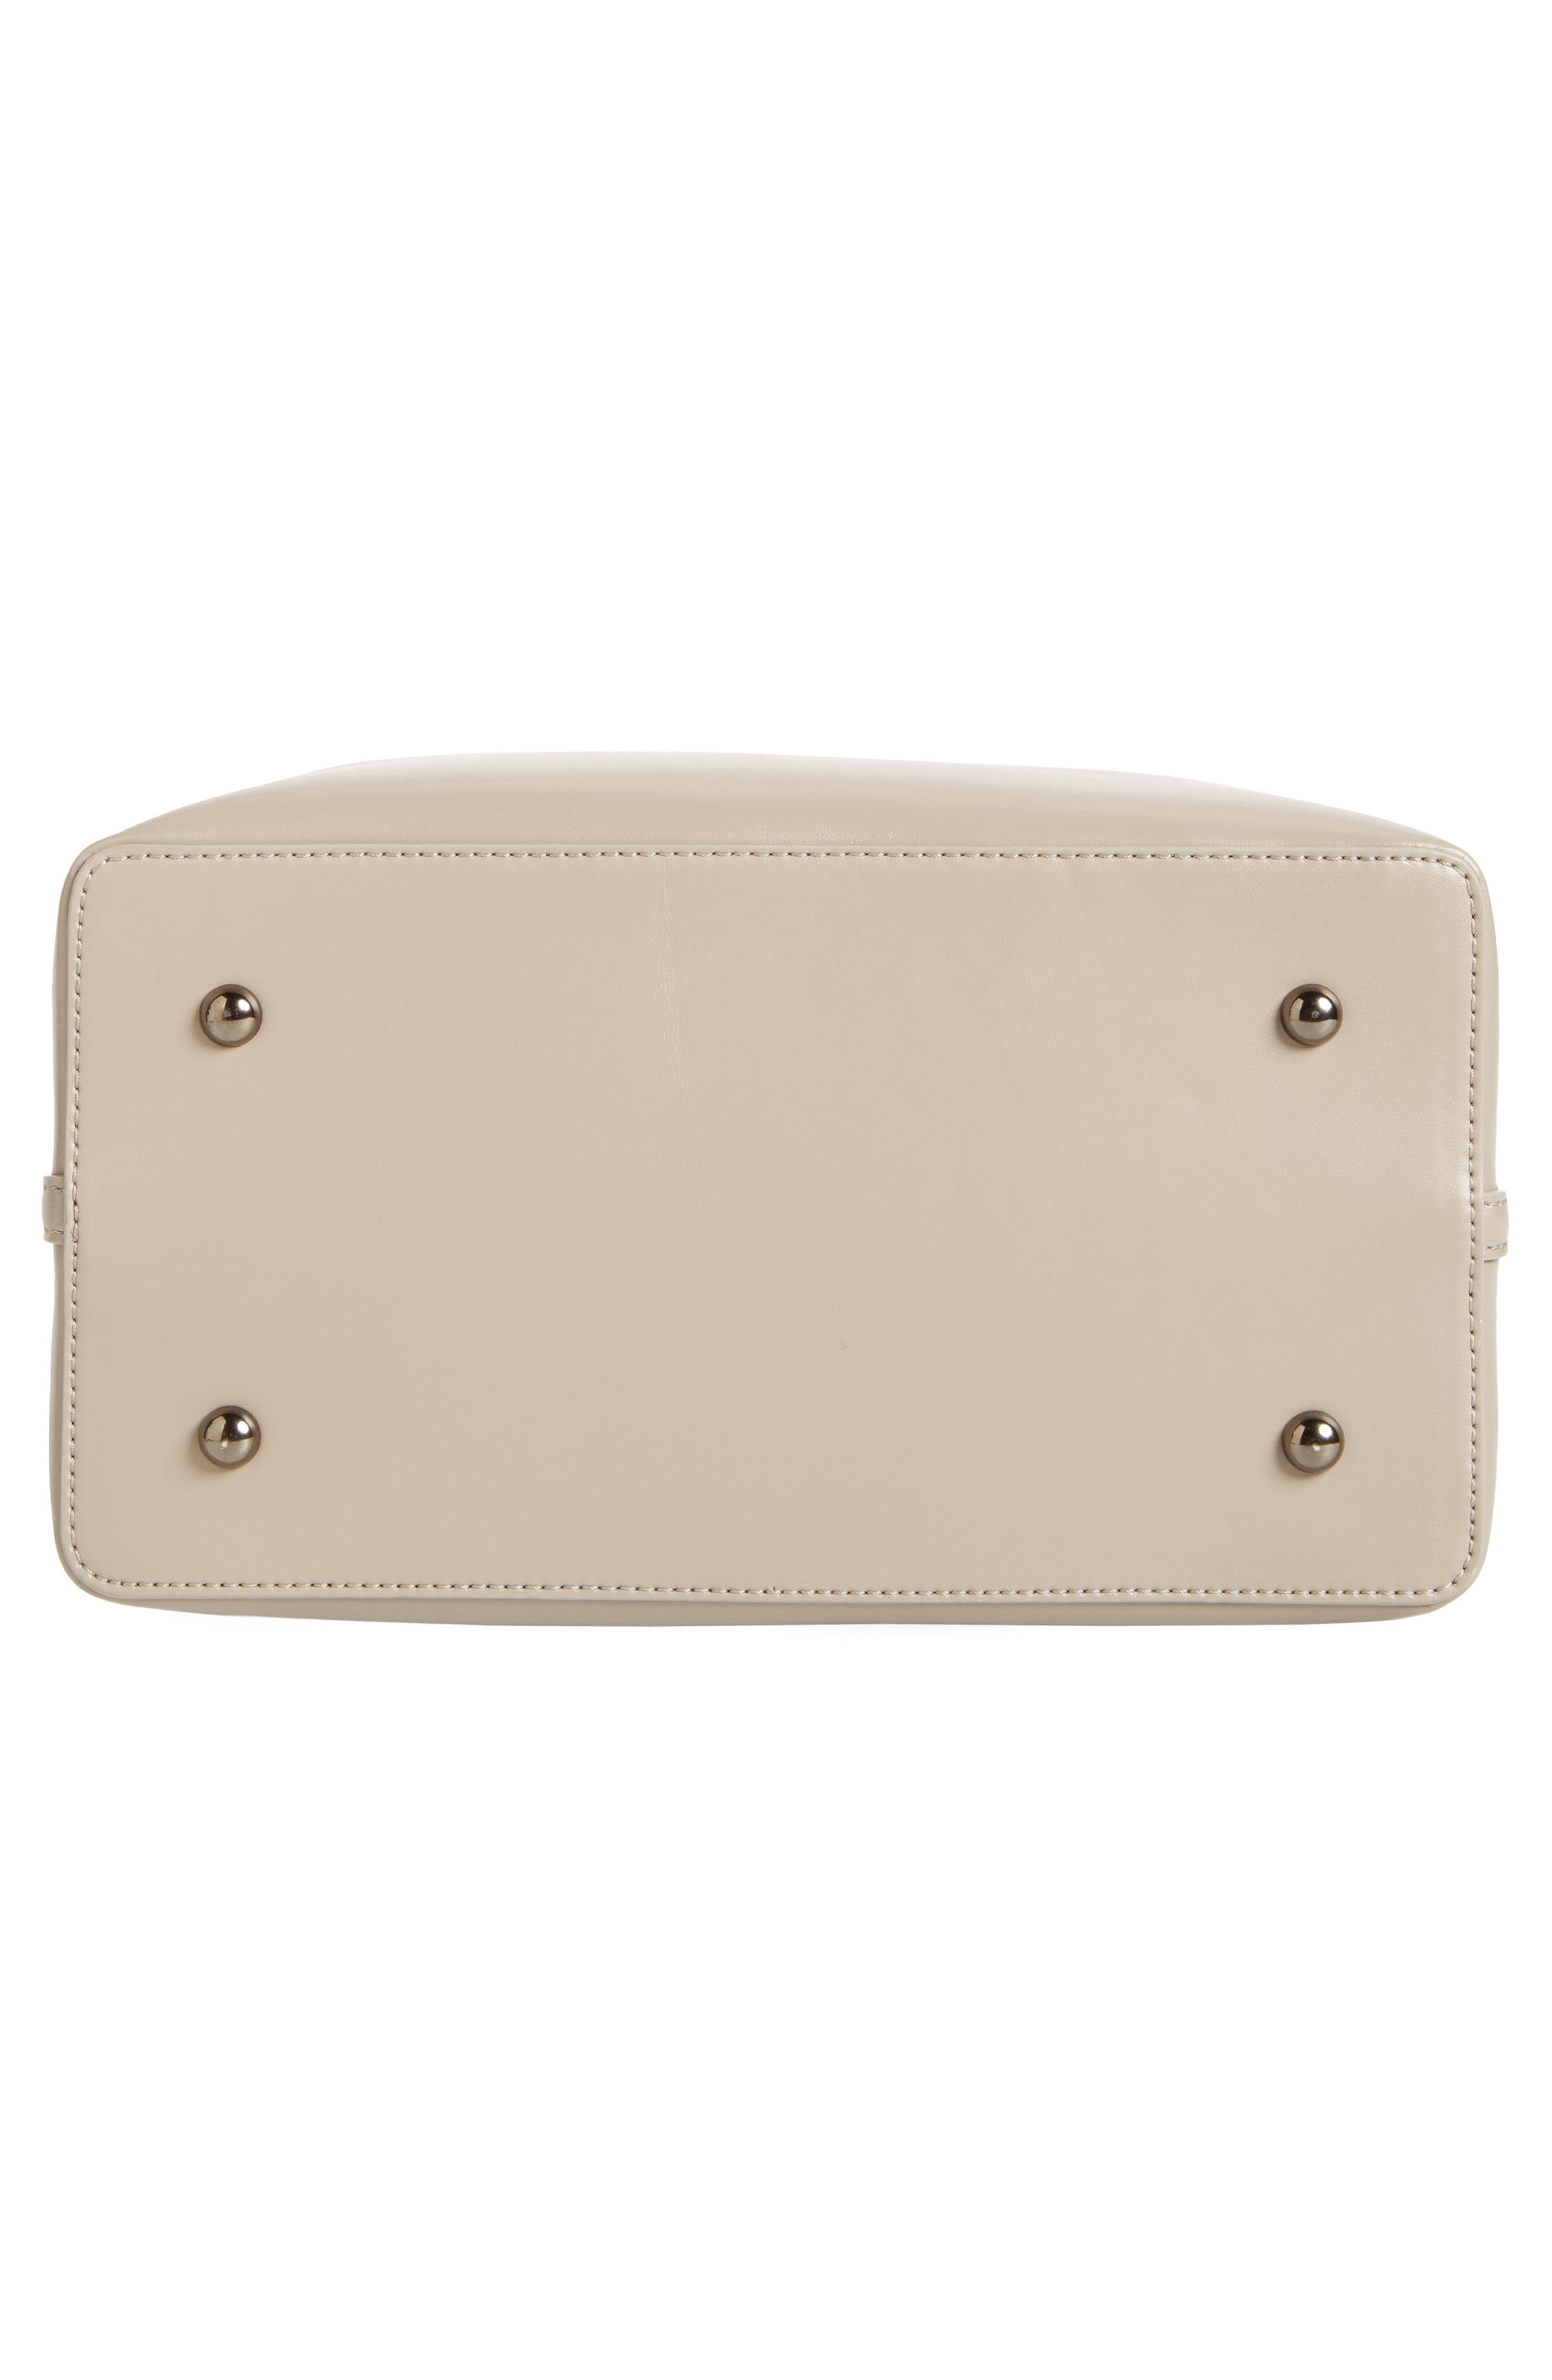 Raisin Leather Handbag,                             Alternate thumbnail 43, color,